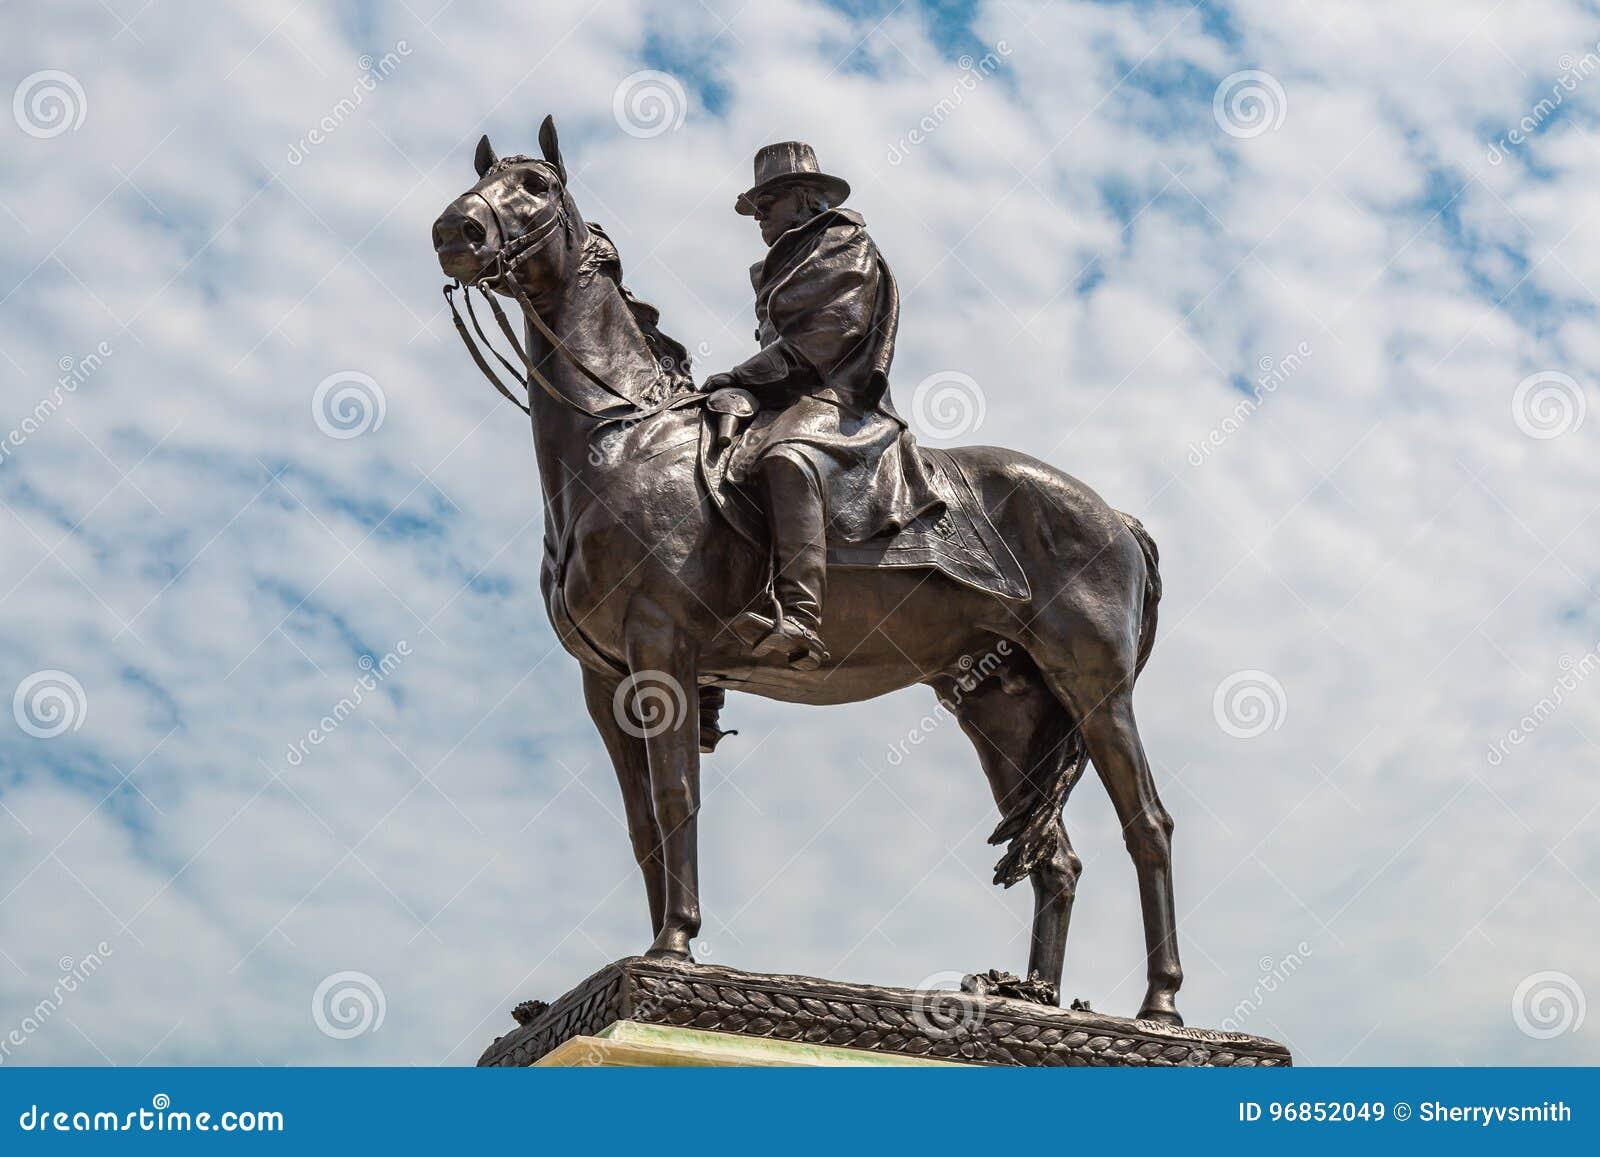 Ulysses S Grant Memorial Statue in Washington, gelijkstroom